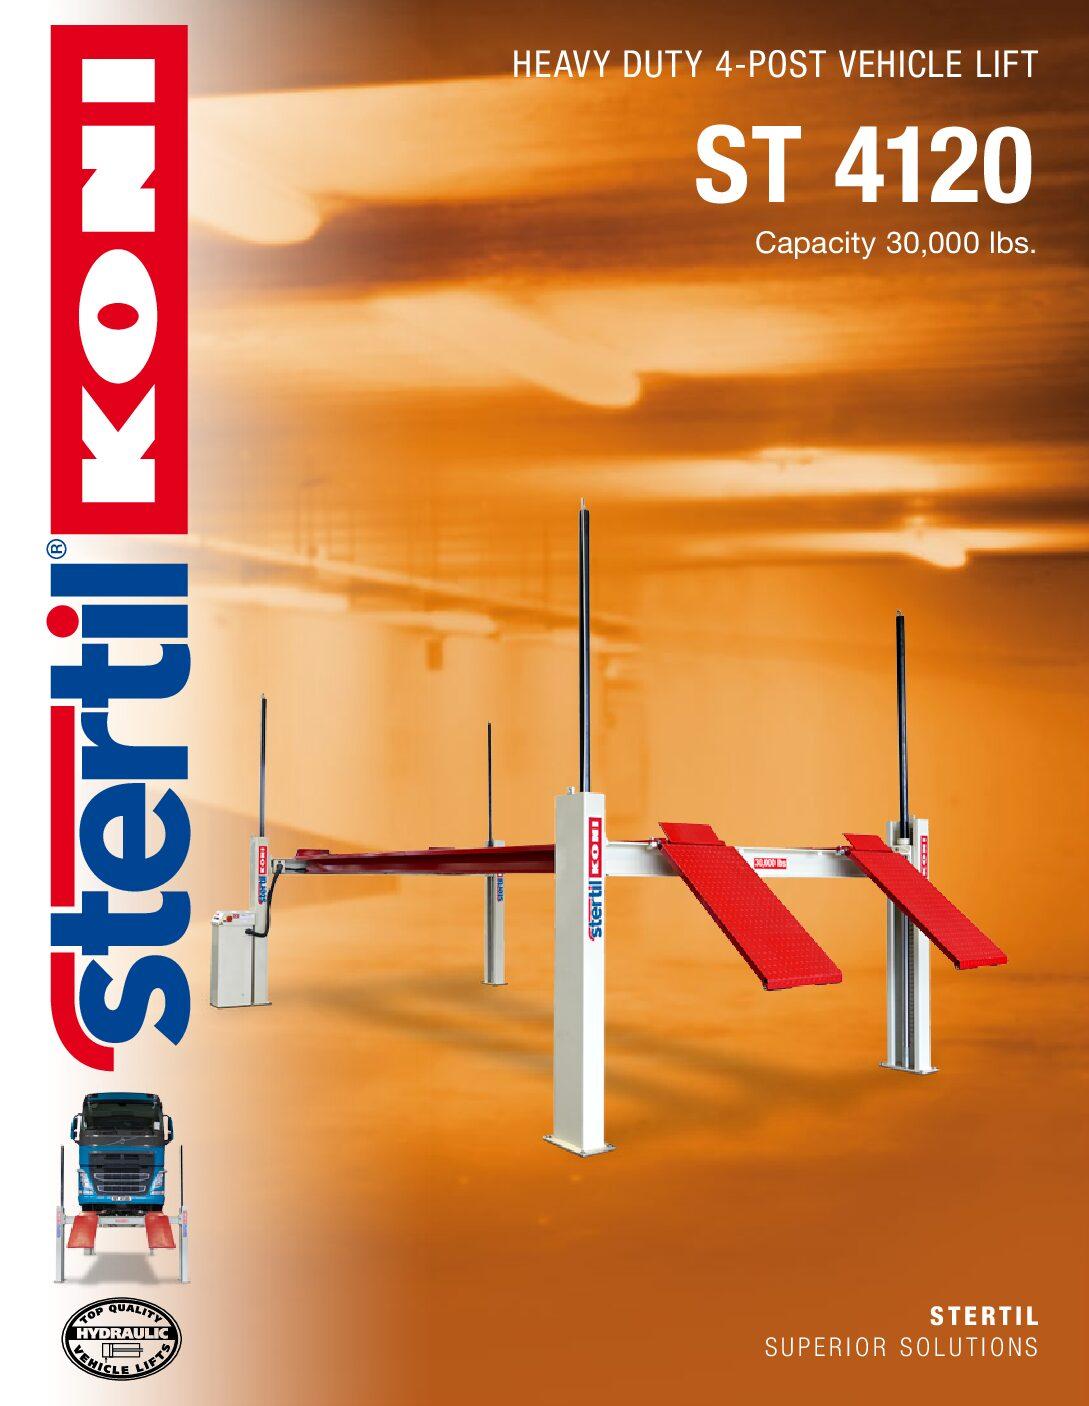 Stertil-Koni: ST 4120 – US Version